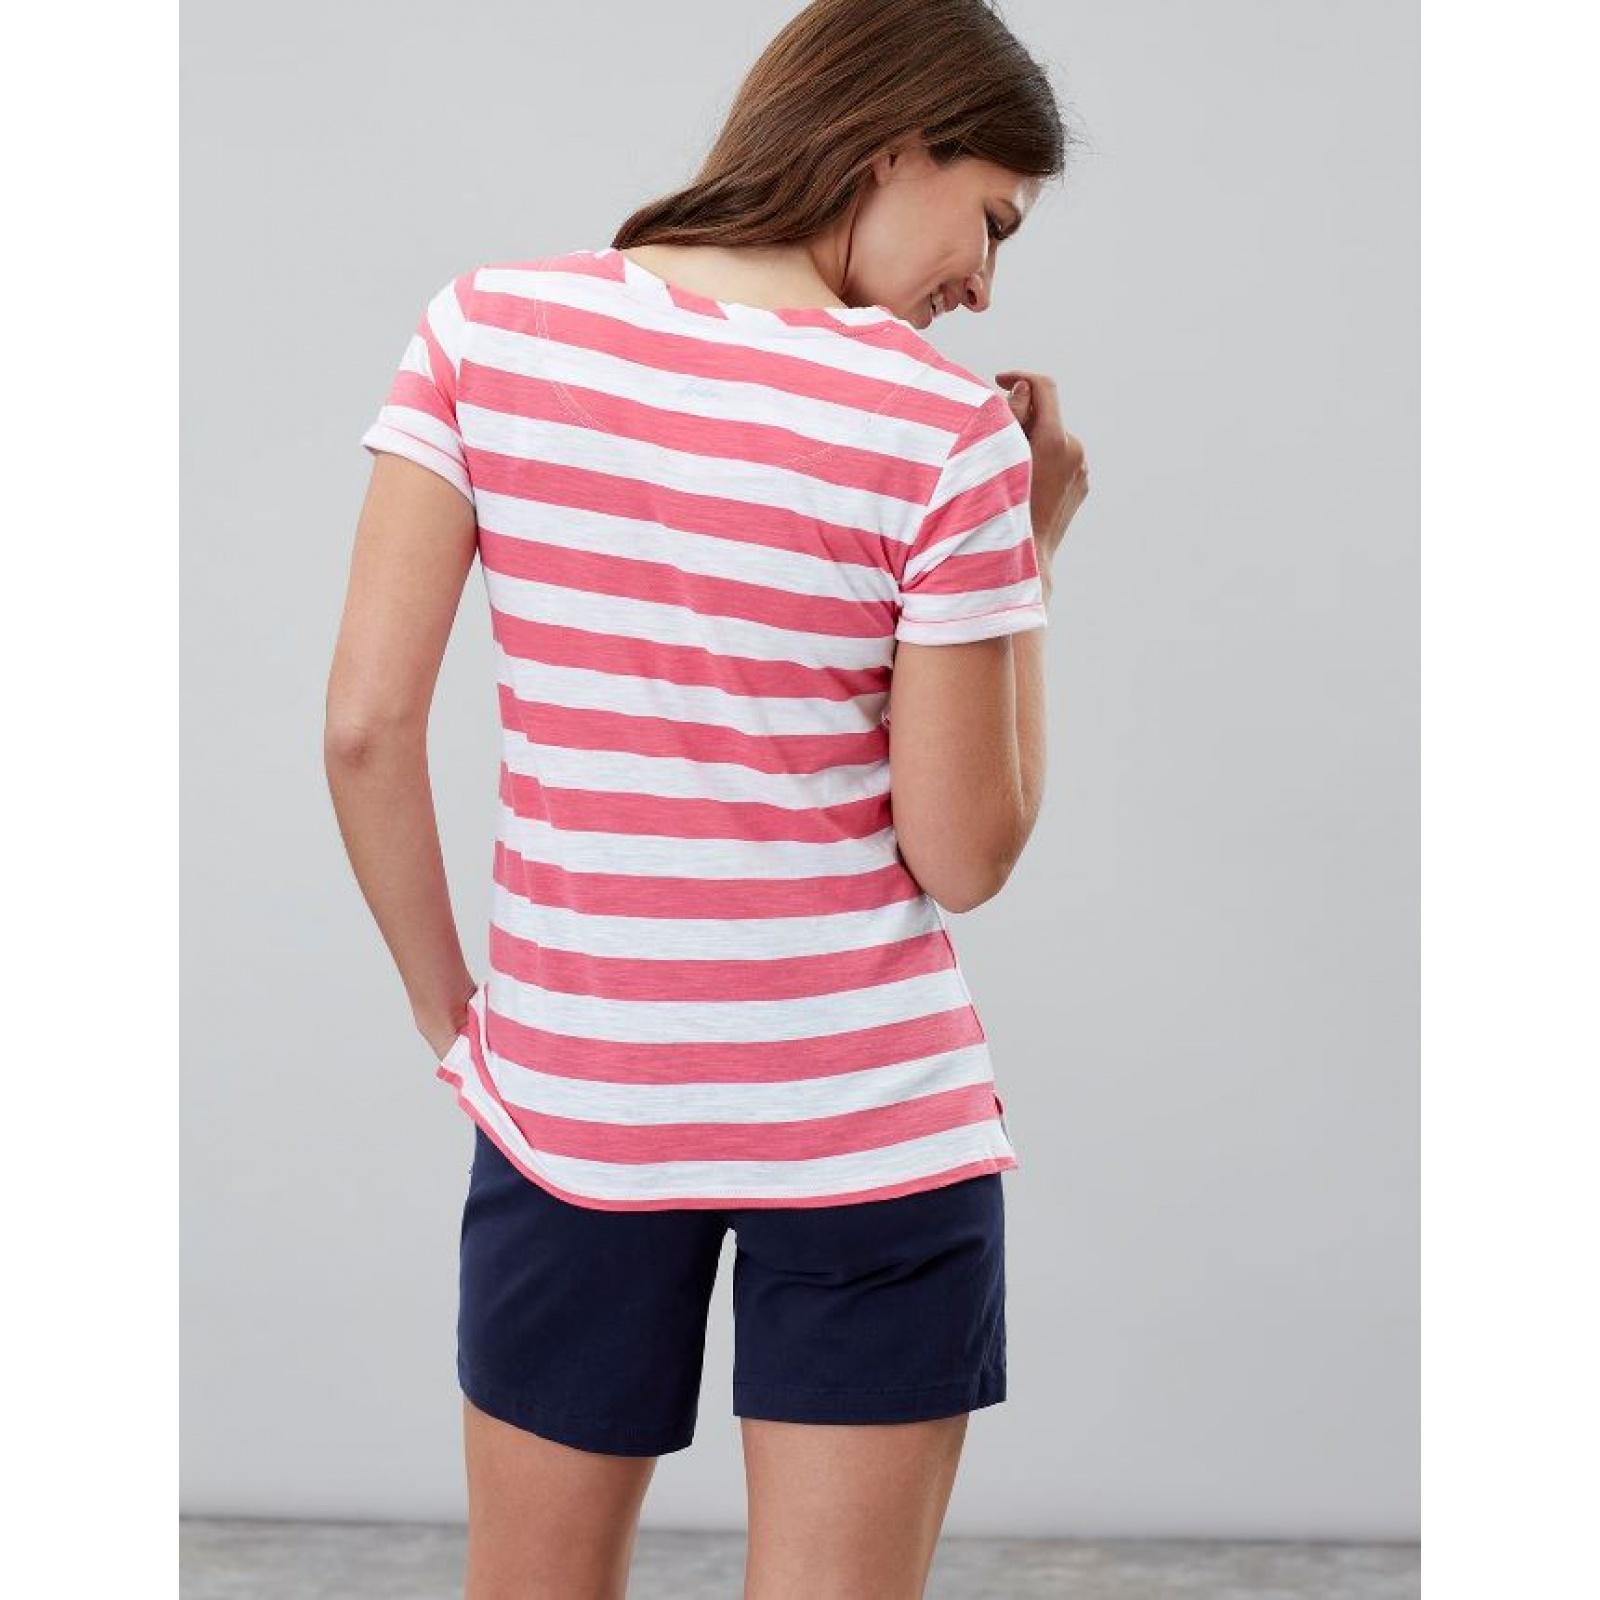 Joules-Nessa-Raya-Ligero-Jersey-Camiseta-SS19 miniatura 25